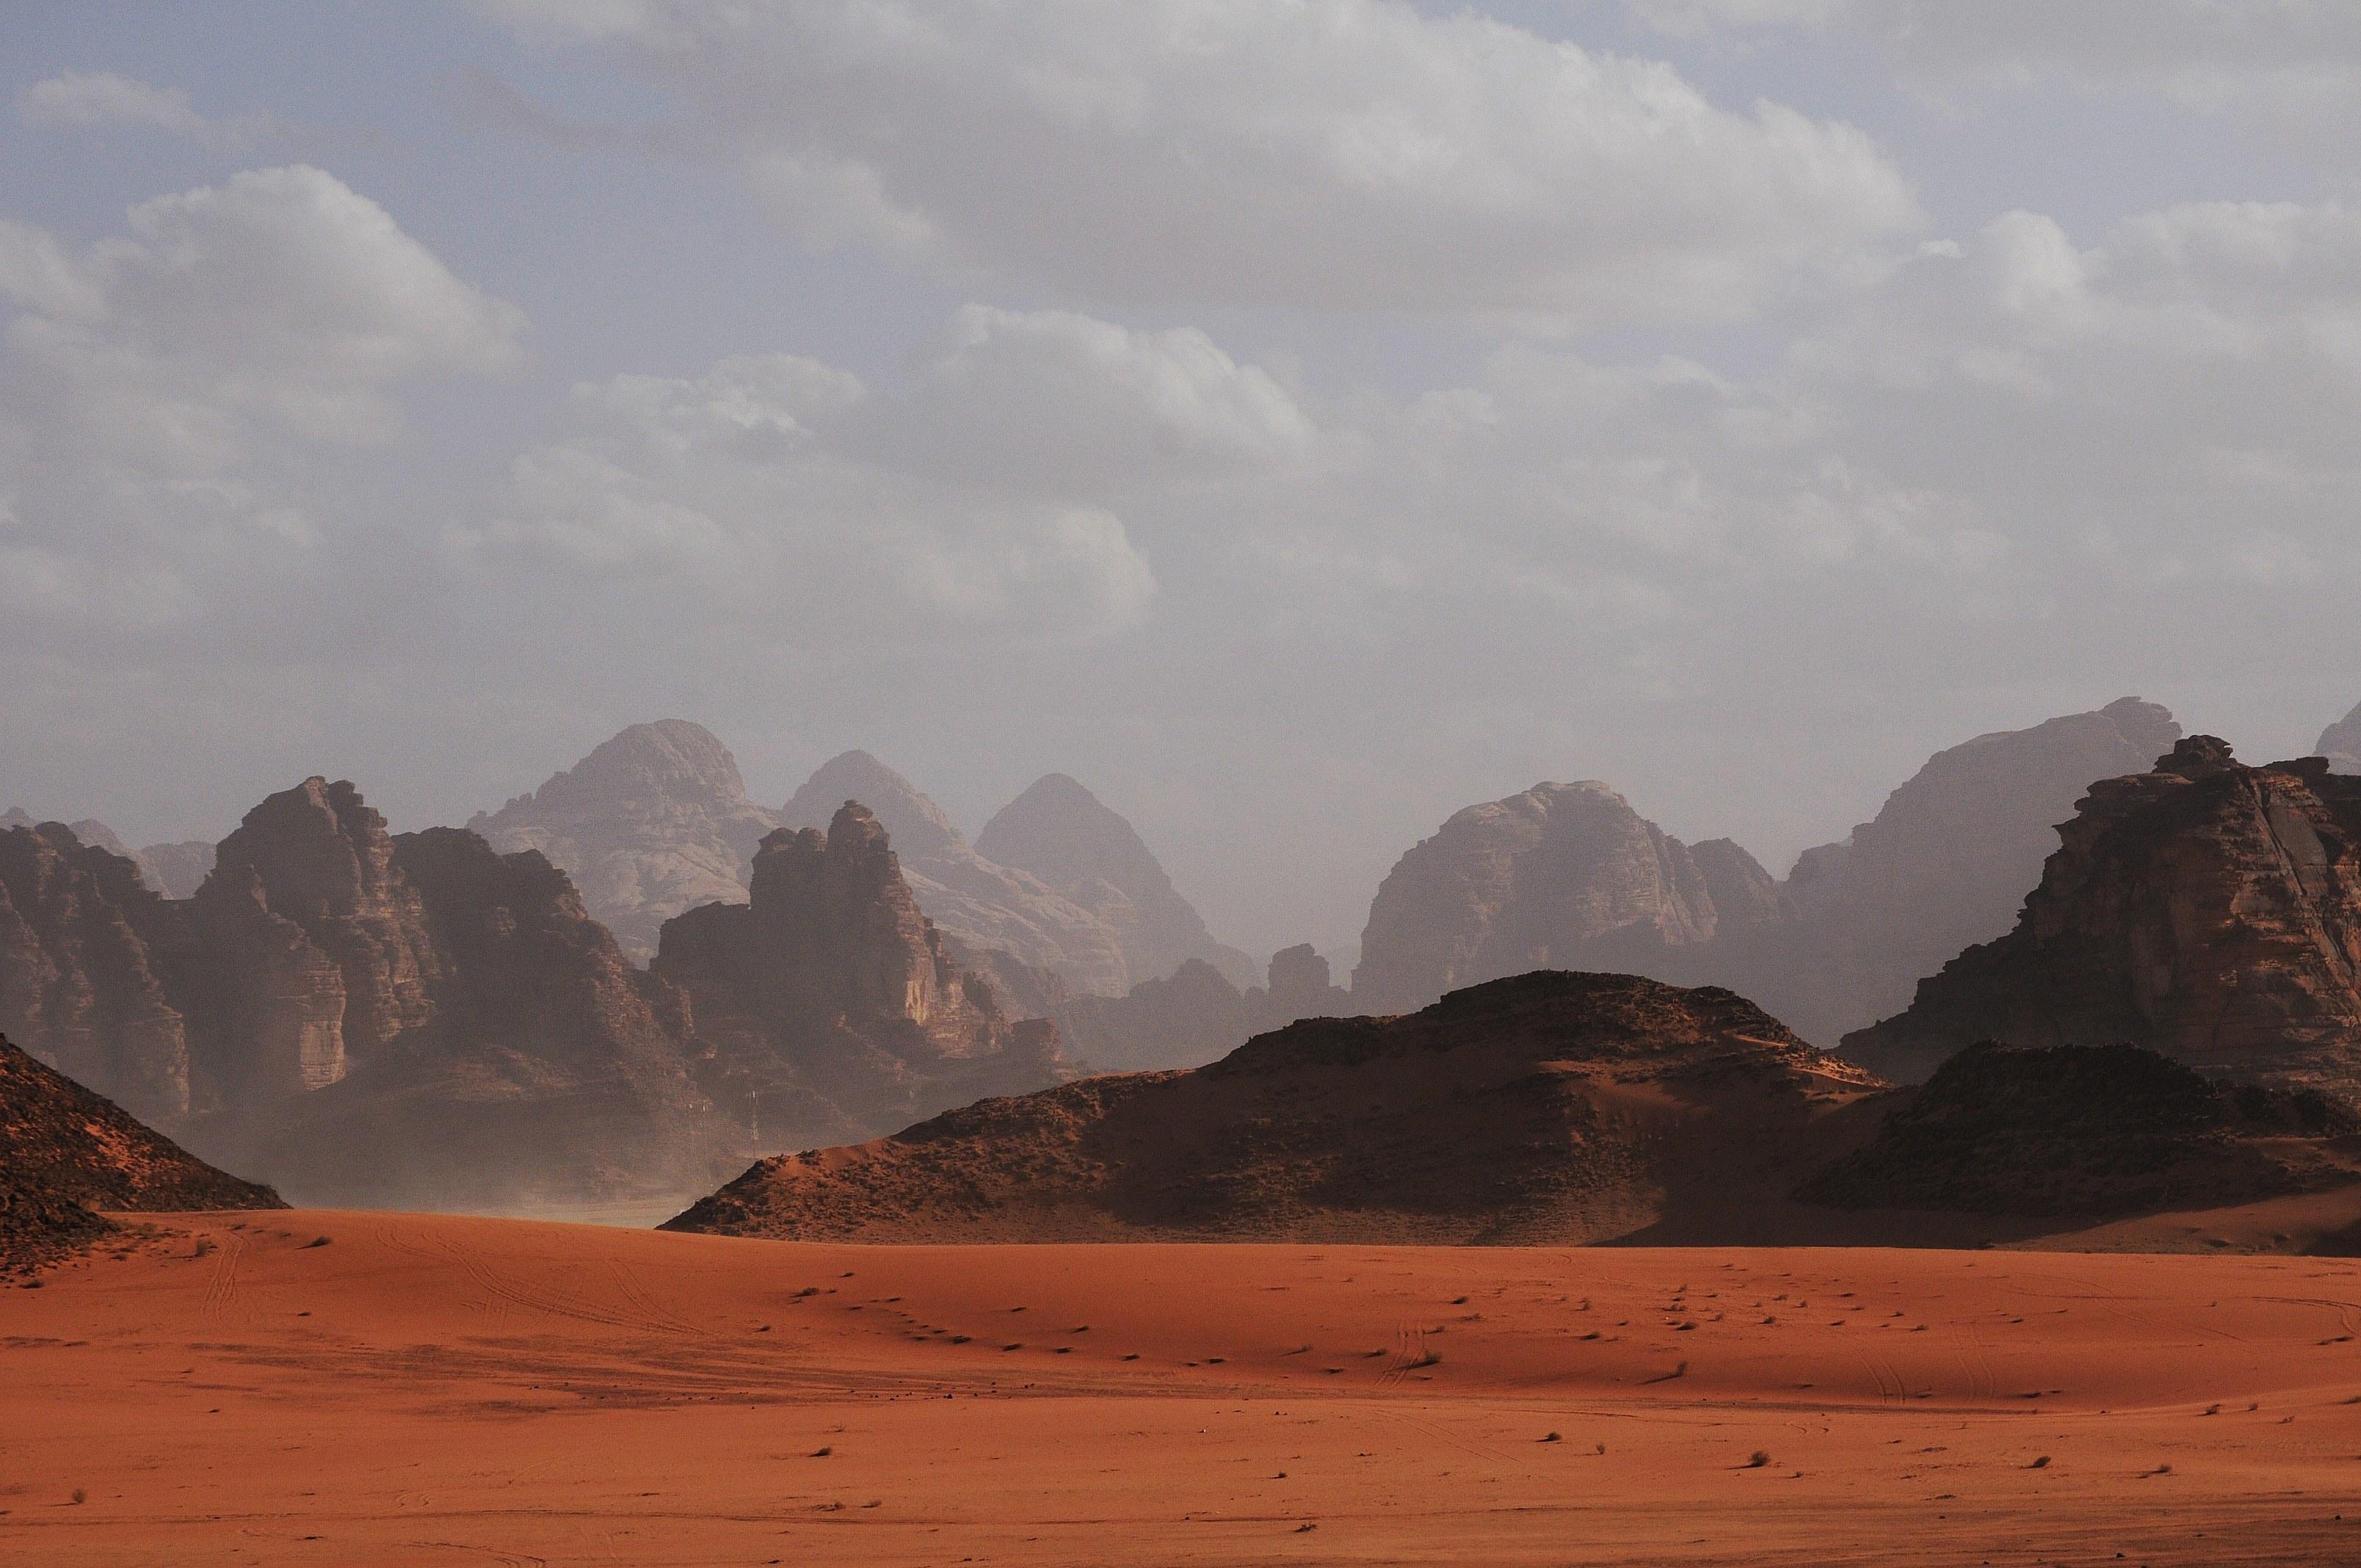 Photo by Juli Kosolapova: Mars akaWadi Rum, Aqaba, Jordan